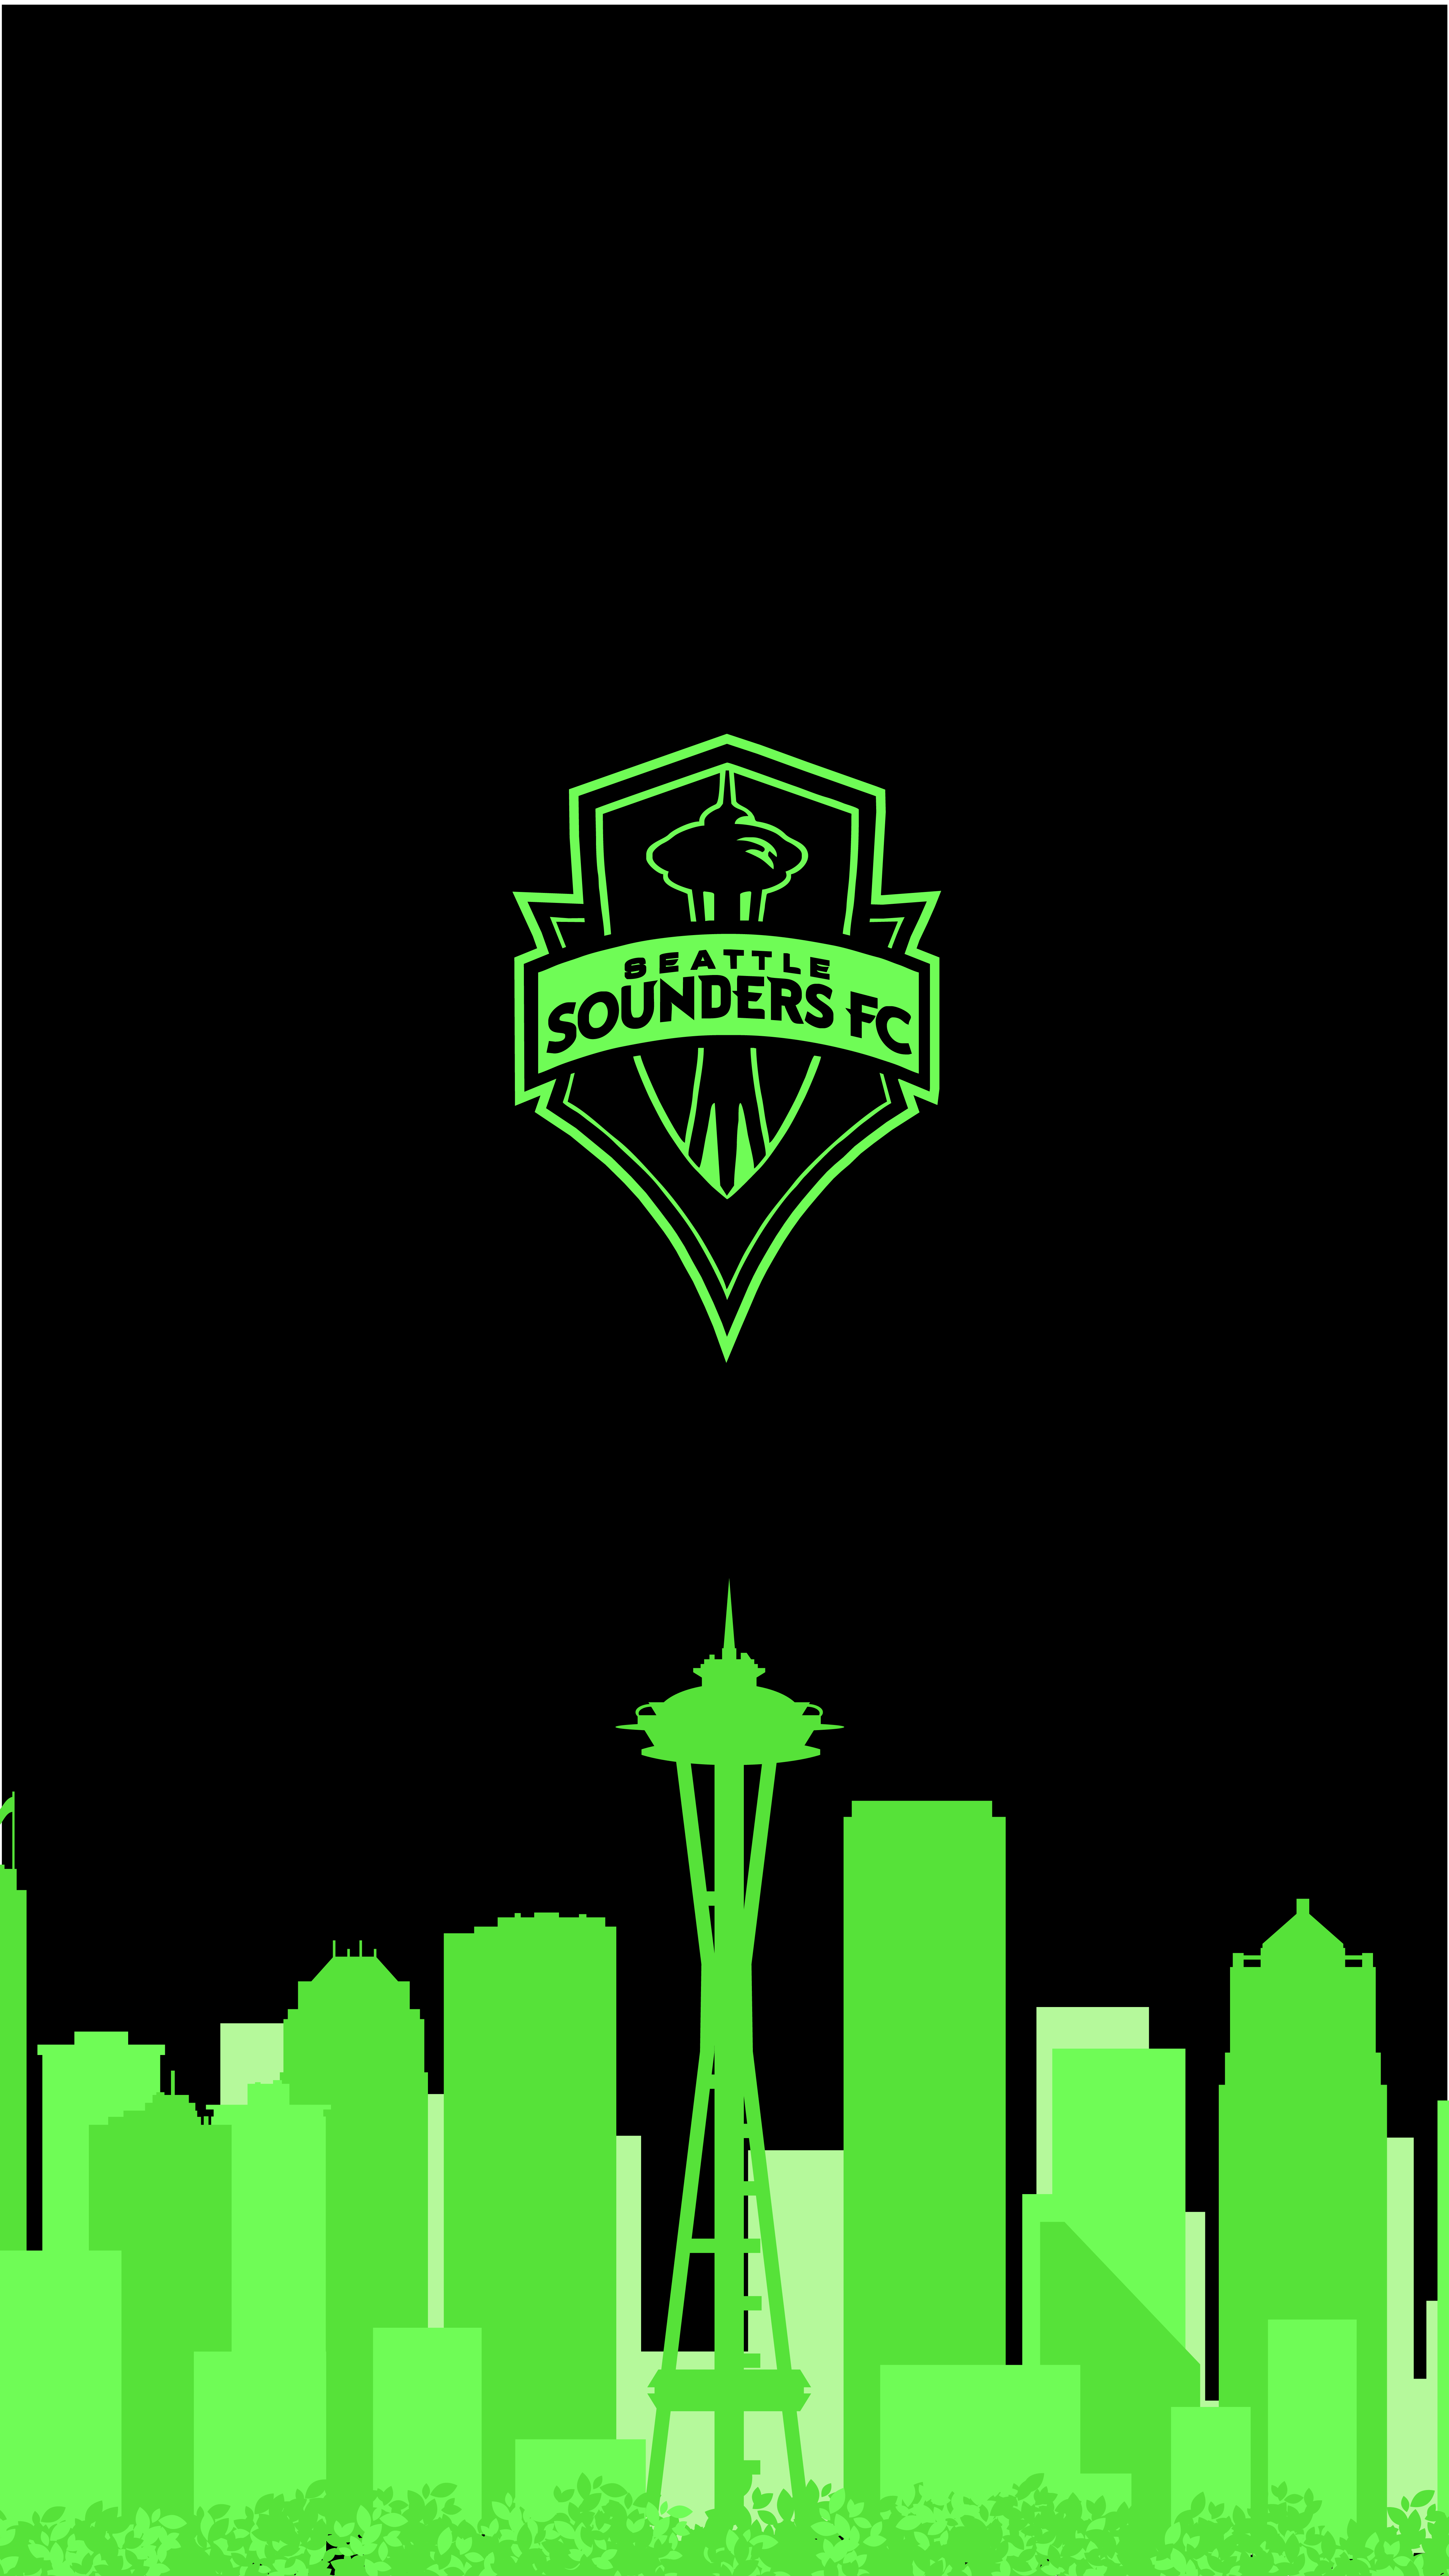 Seattle Sounders IPhone Wallpaper 85K88CK   Picseriocom 4500x8000